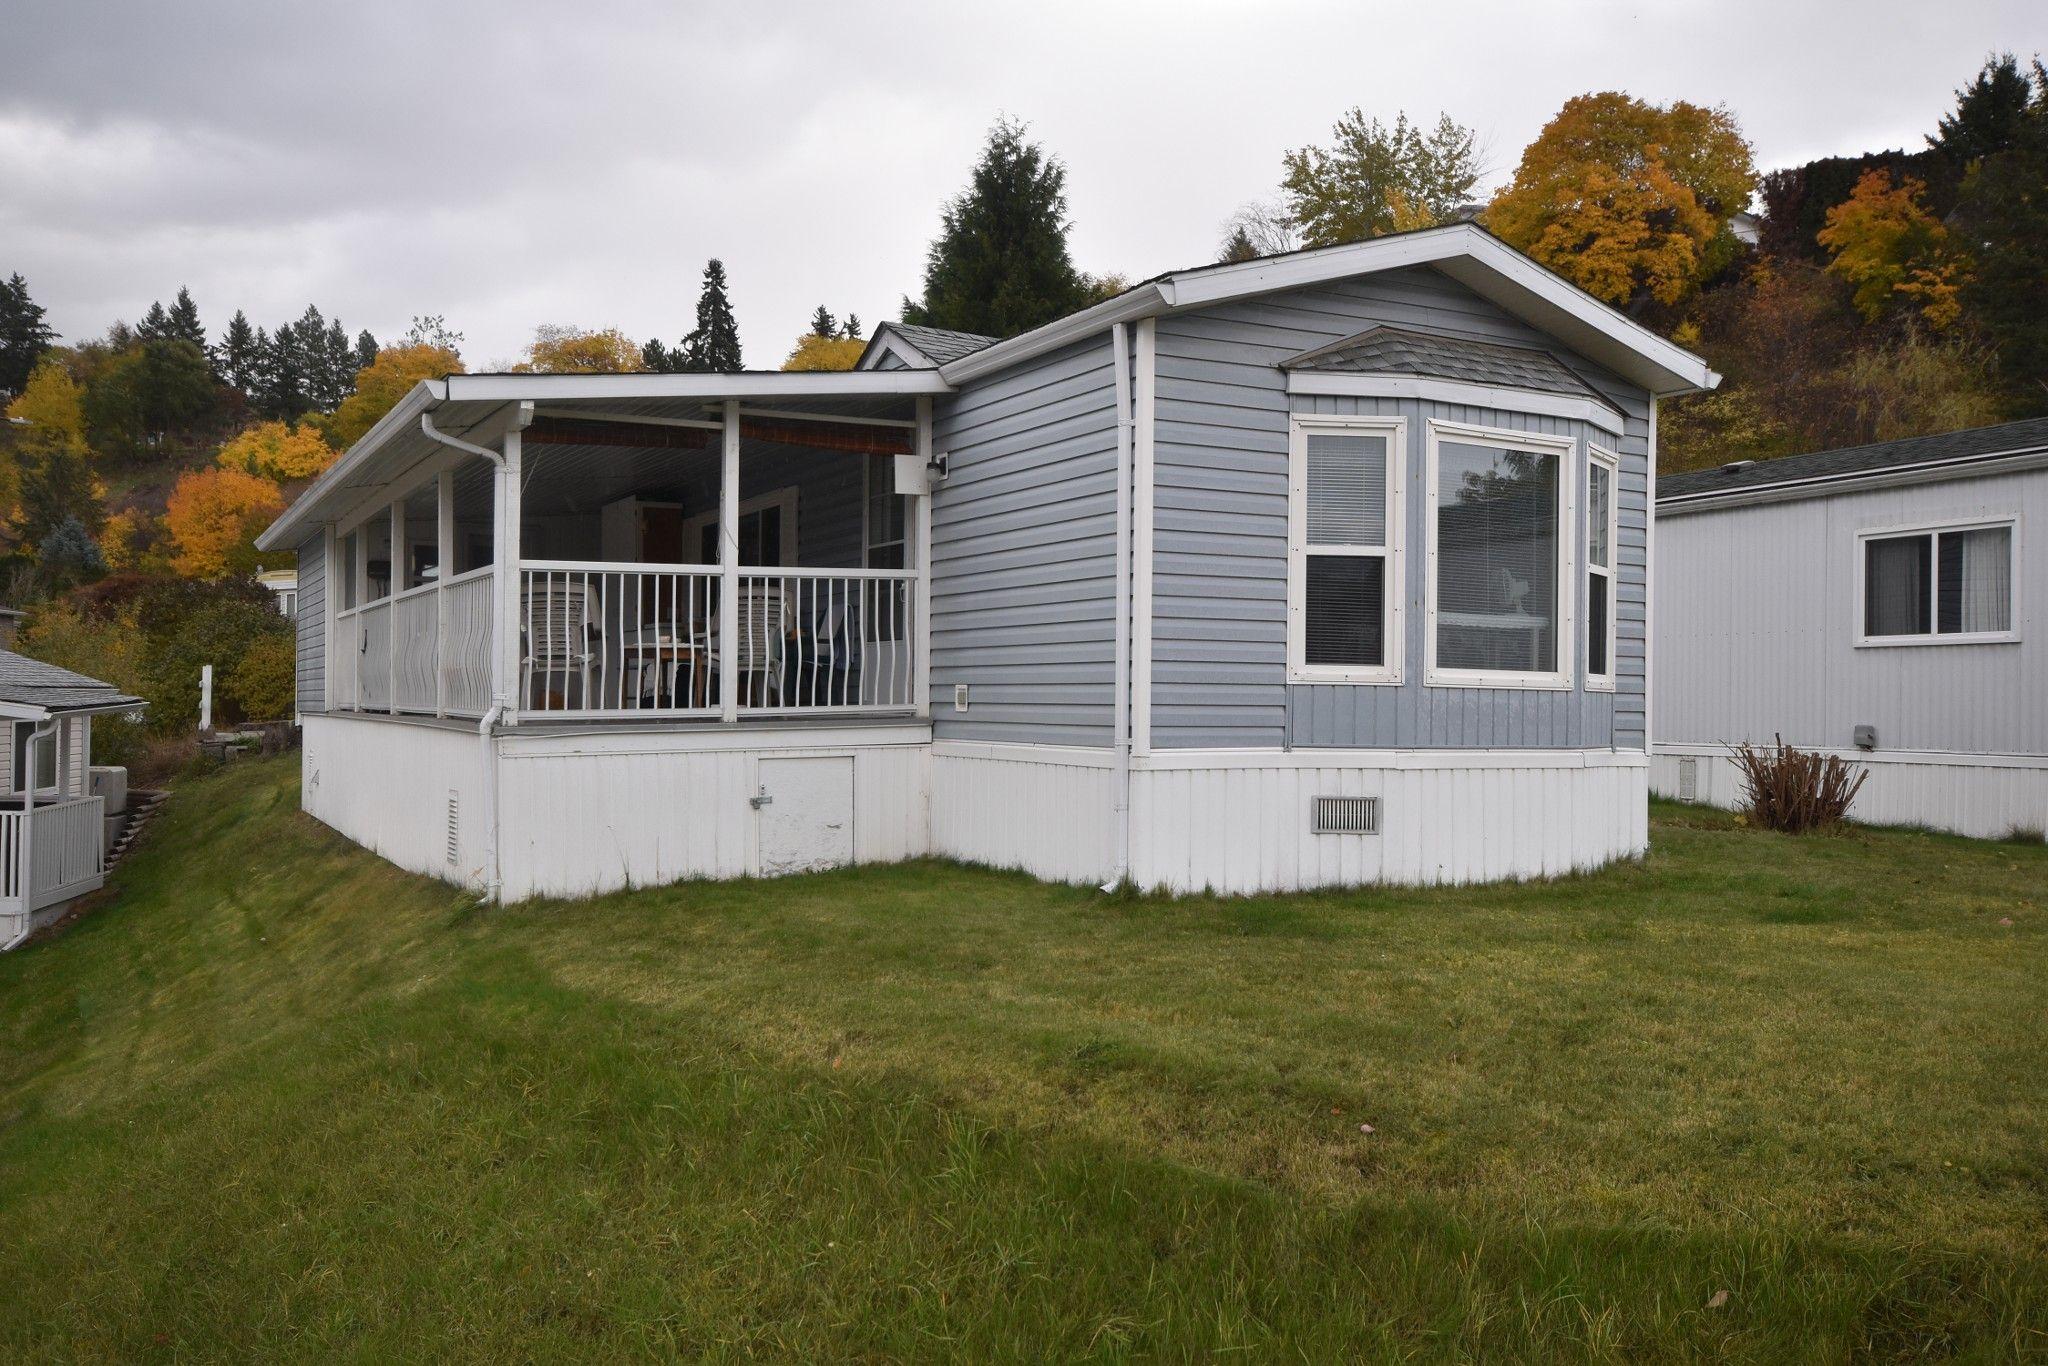 Main Photo: 178 15401 Kalamalka Road in Coldstream: Mun of Coldstream House for sale (North Okanagan)  : MLS®# 10194389